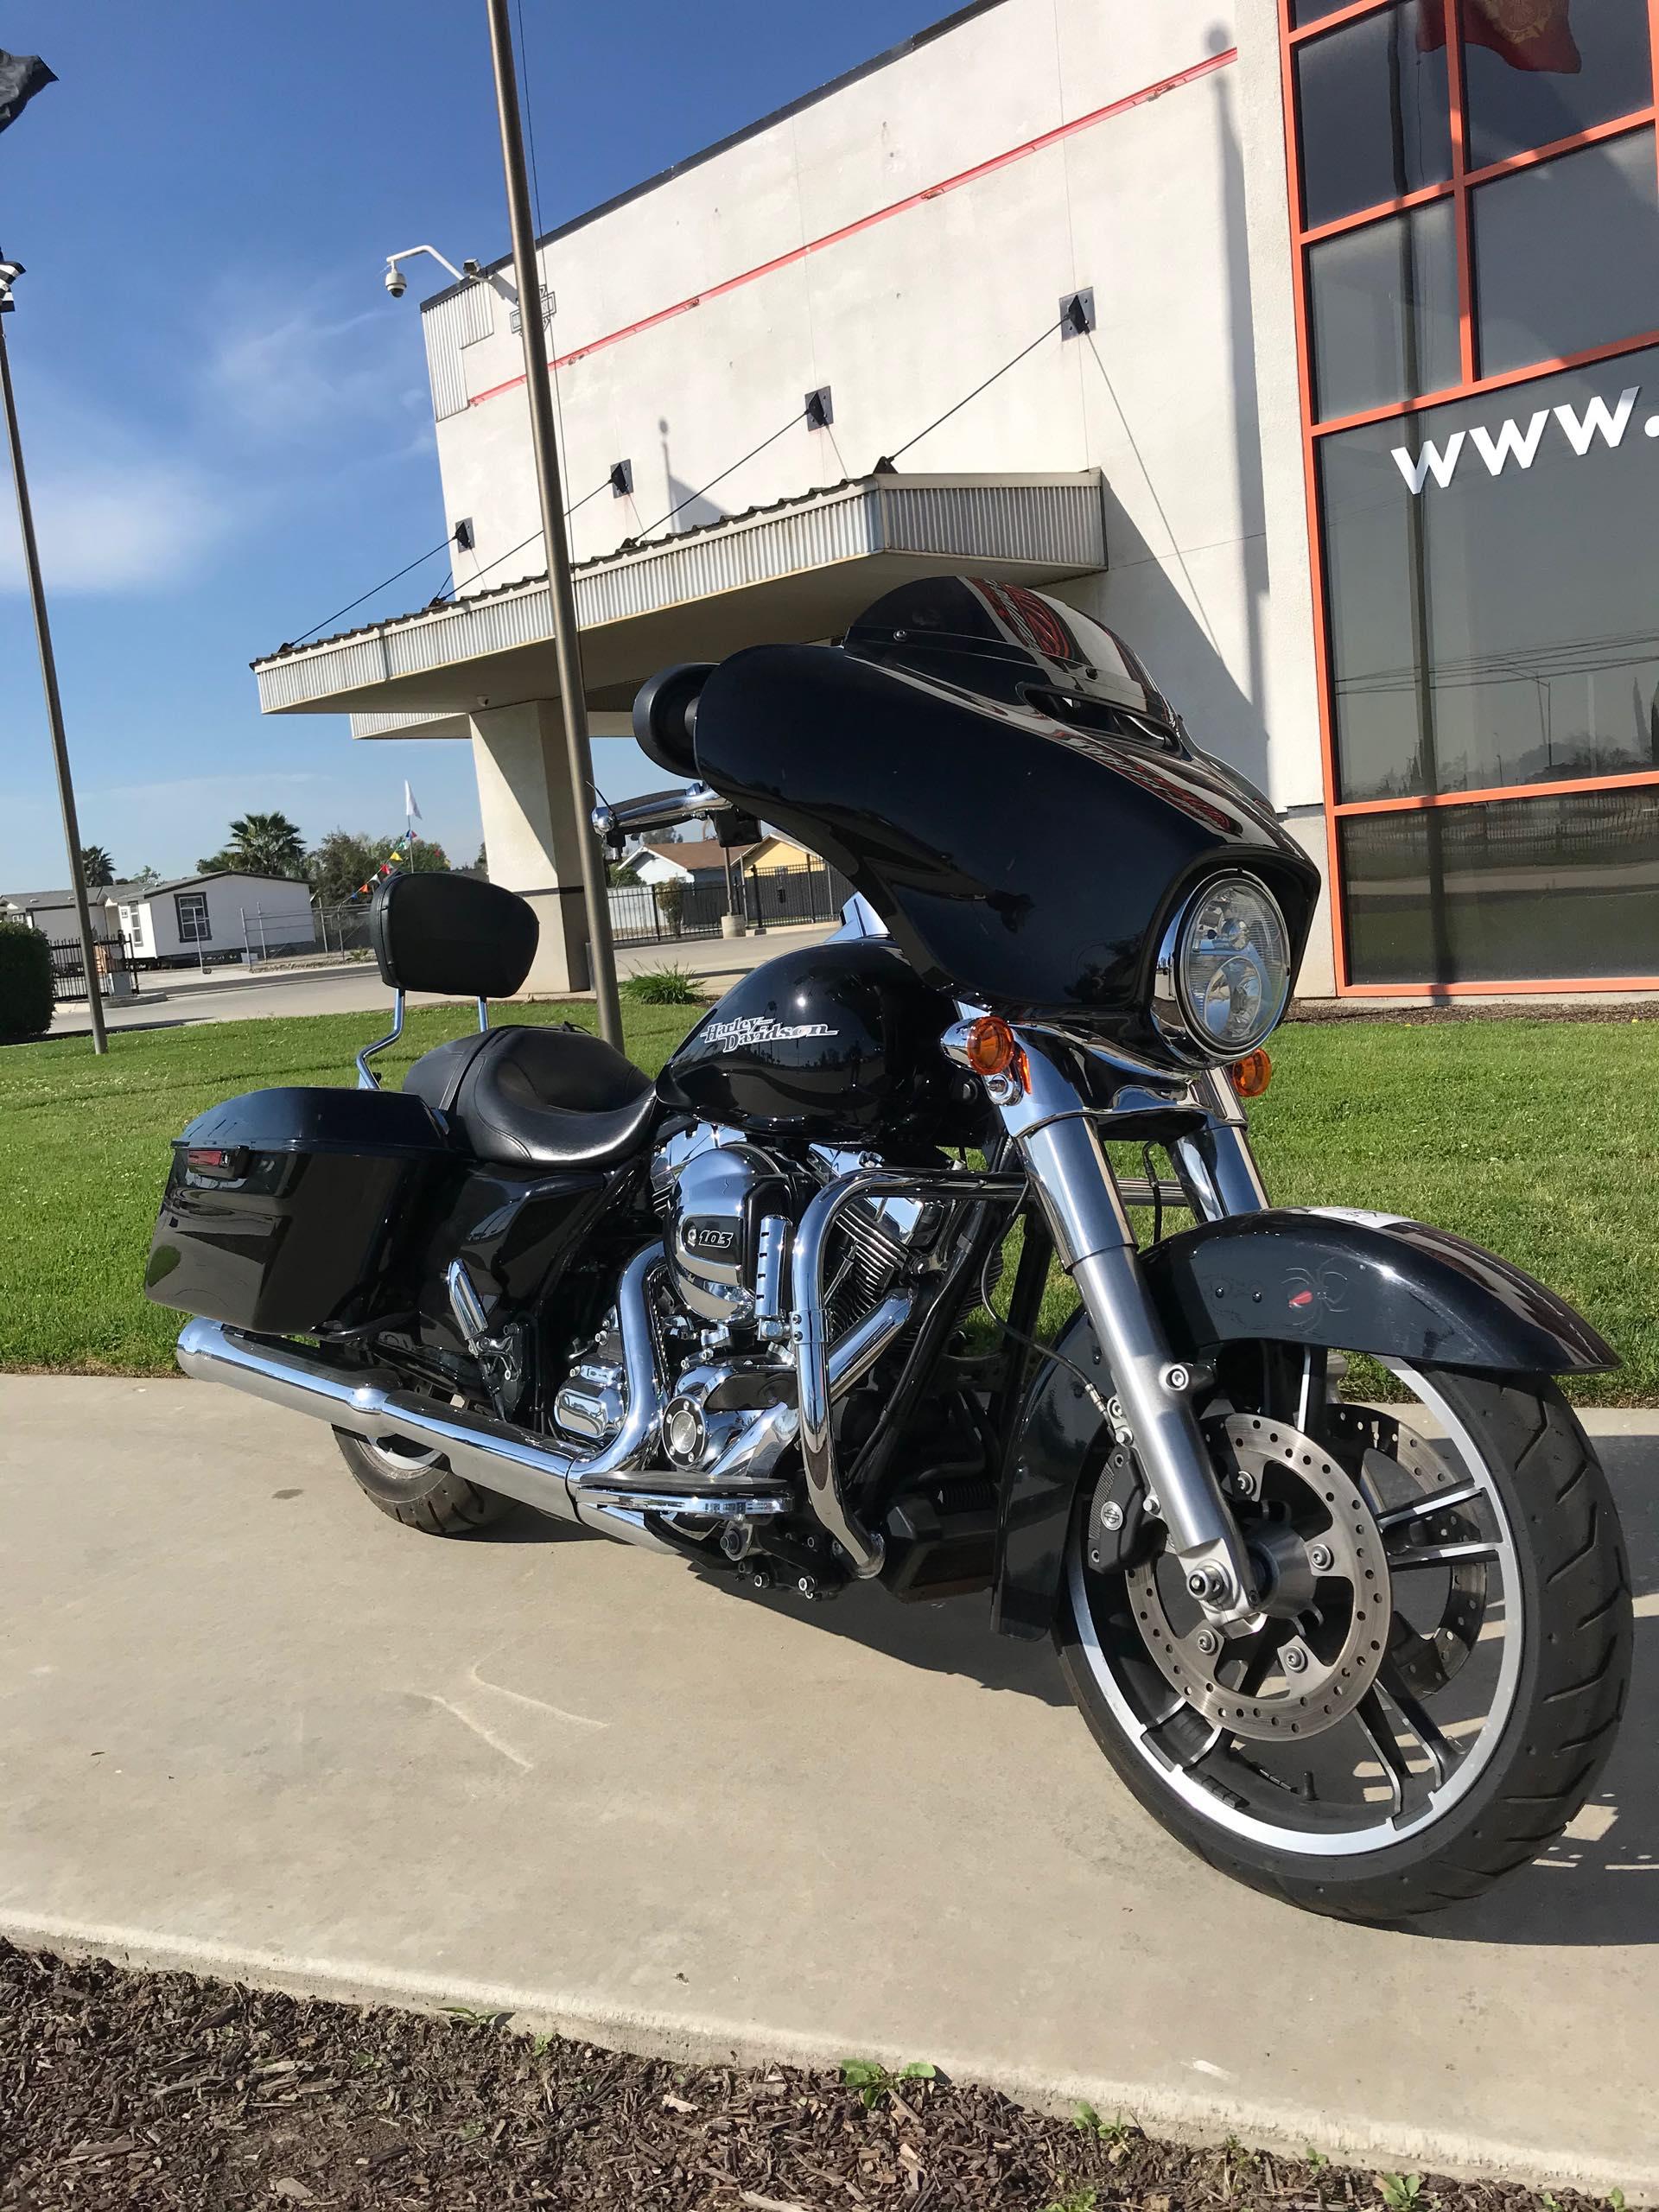 2016 Harley-Davidson Street Glide Base at Visalia Harley-Davidson